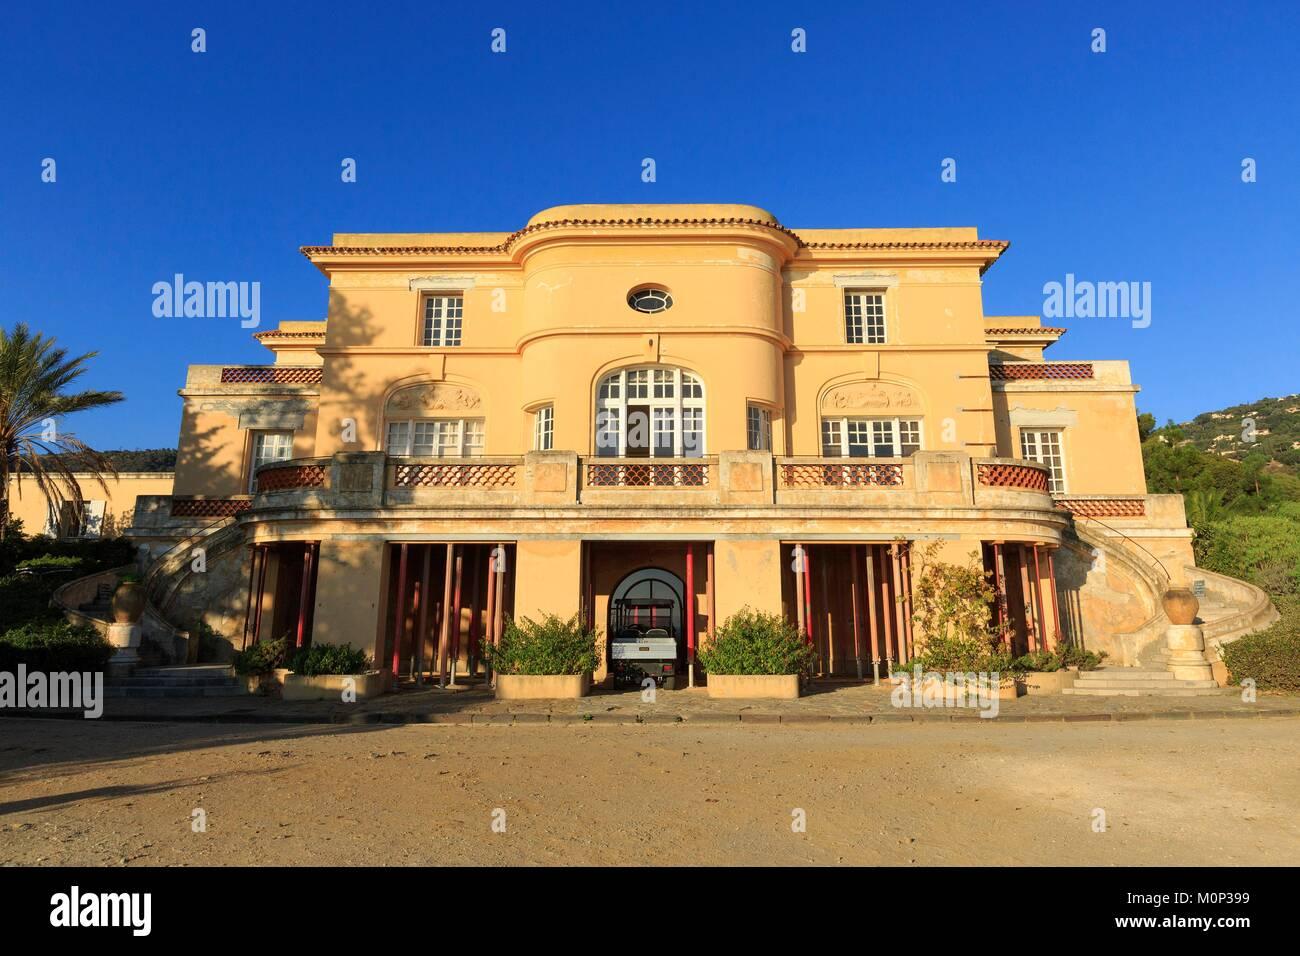 France,Var,Rayol Canadel sur Mer,Domaine du Rayol,Mediterranean garden,property of the Conservatoire du Littoral - Stock Image